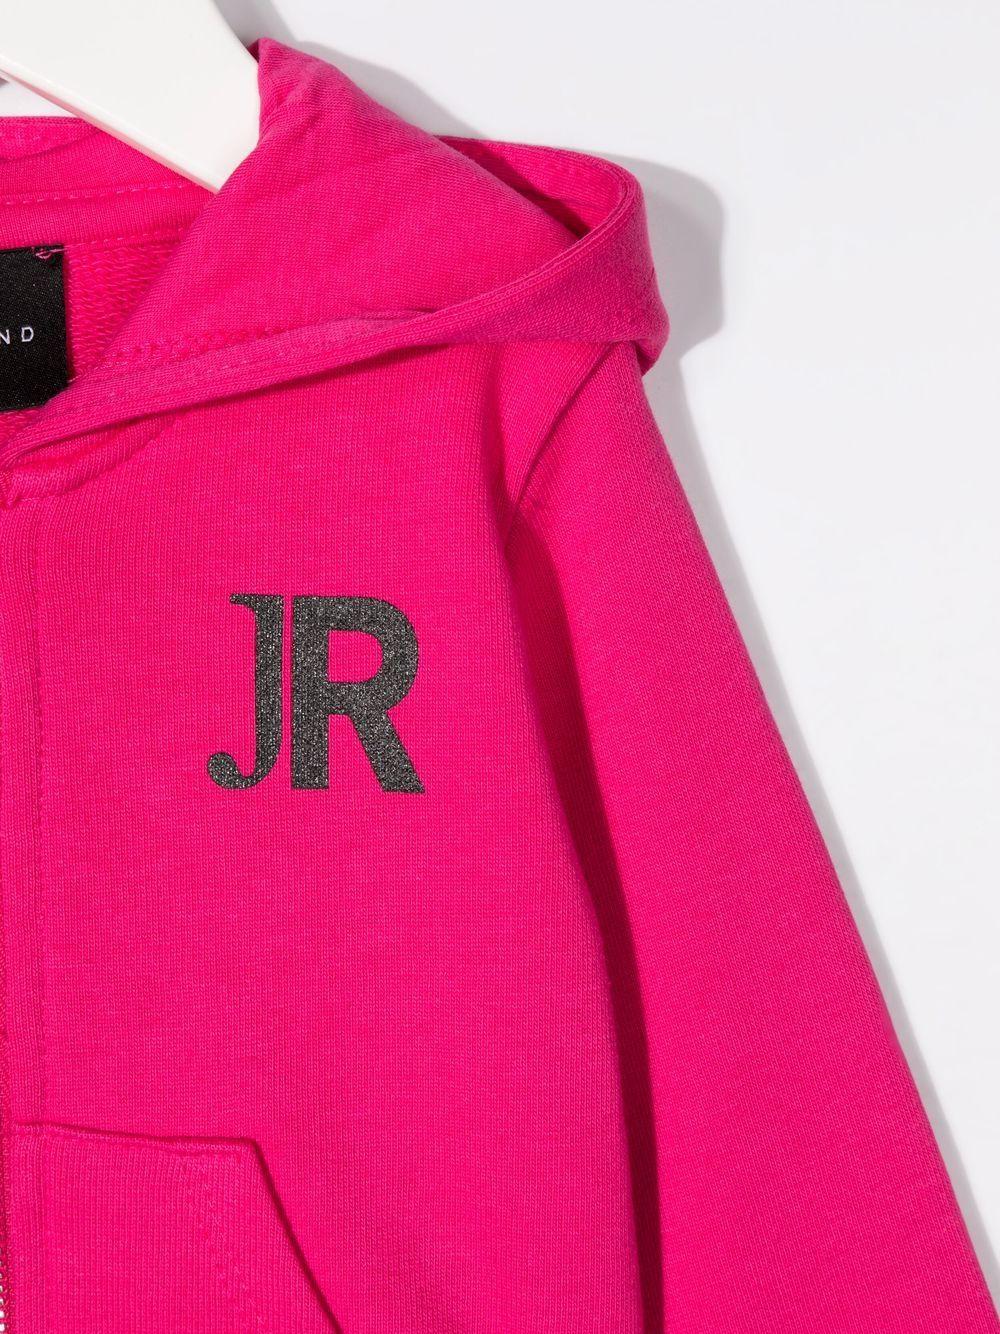 john richmond felpa aperta con cappuccio con stampa logo john richmond   Felpa   RIP21086FEW0486